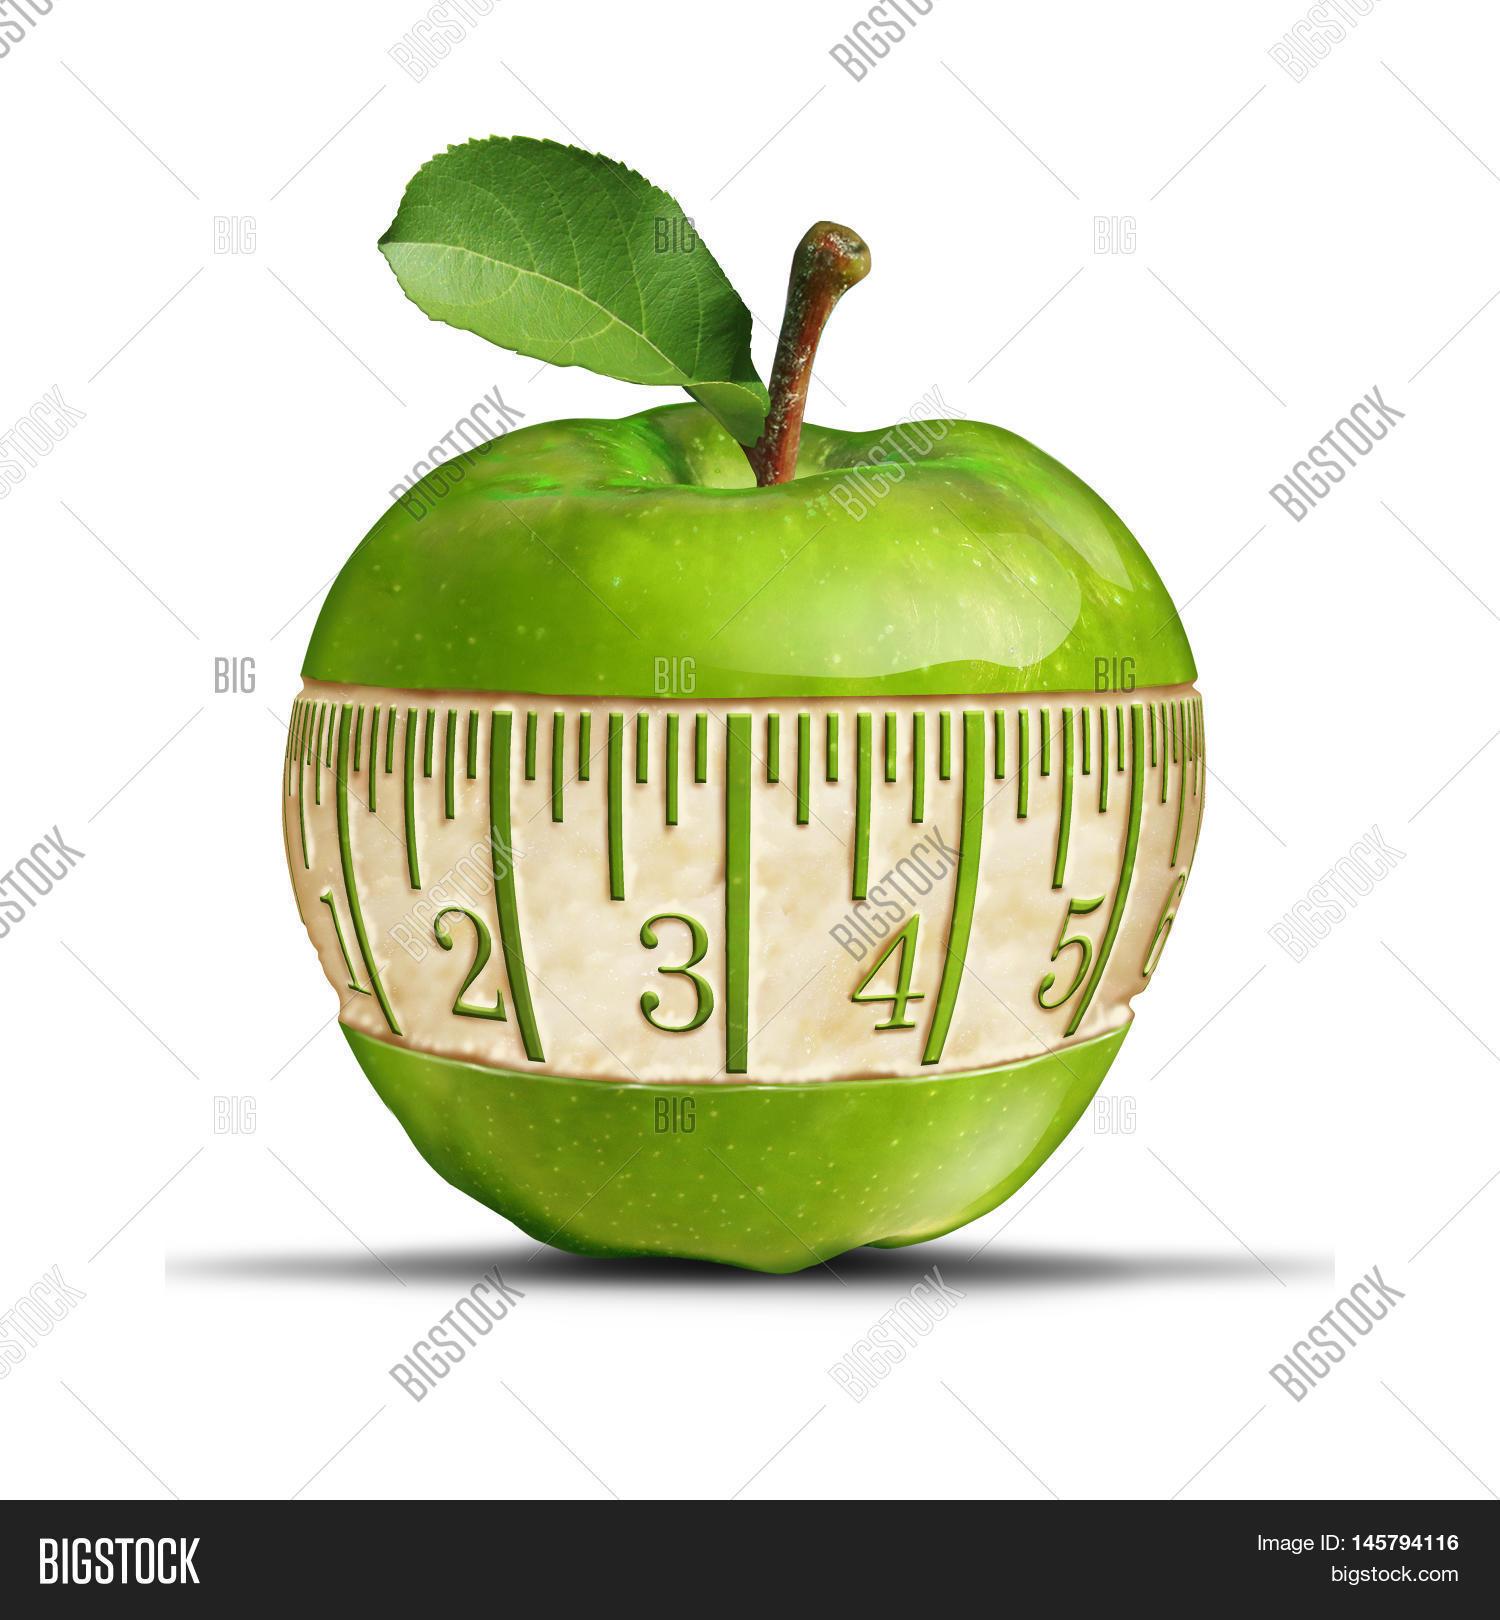 Fitness Green Apple Image Photo Free Trial Bigstock